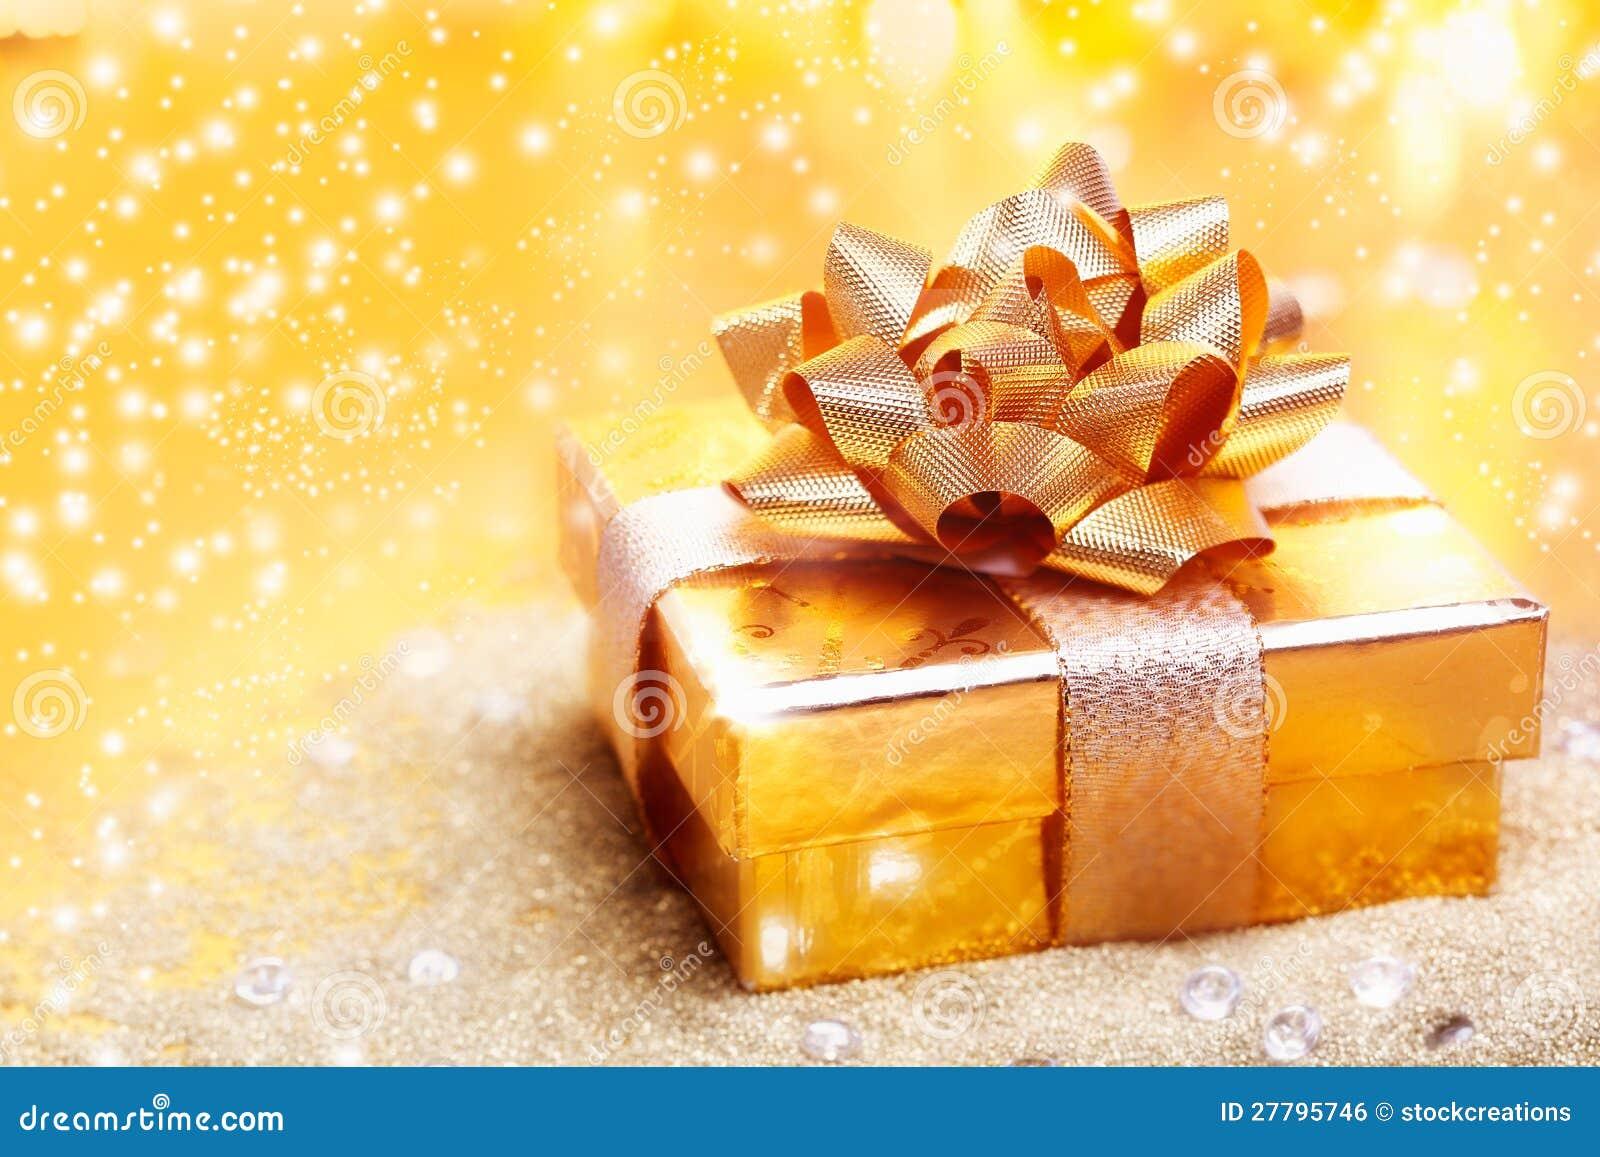 Luxury Golden Gift Royalty Free Stock Image Image 27795746